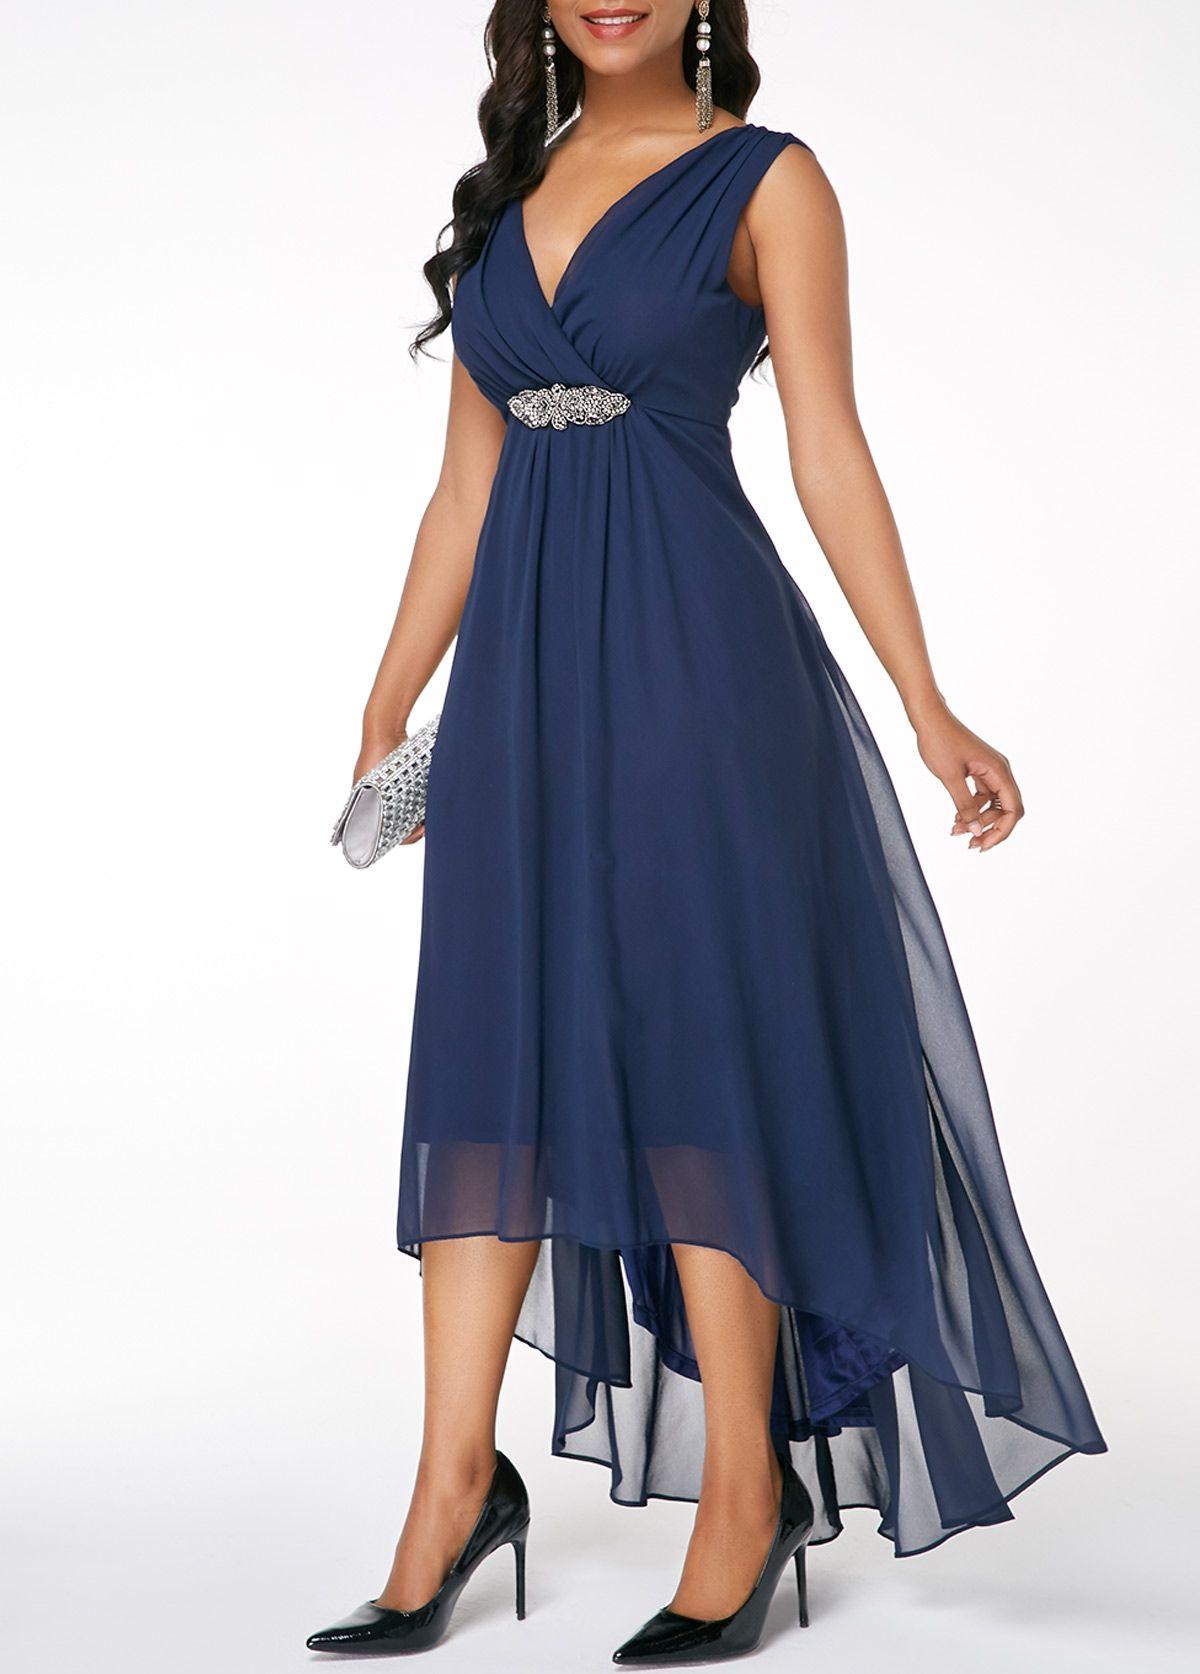 Sleeveless V Back High Low Navy Blue Dress Rosewe Com Usd 36 00 Navy Cocktail Dress Blue Dresses Fashion Dresses